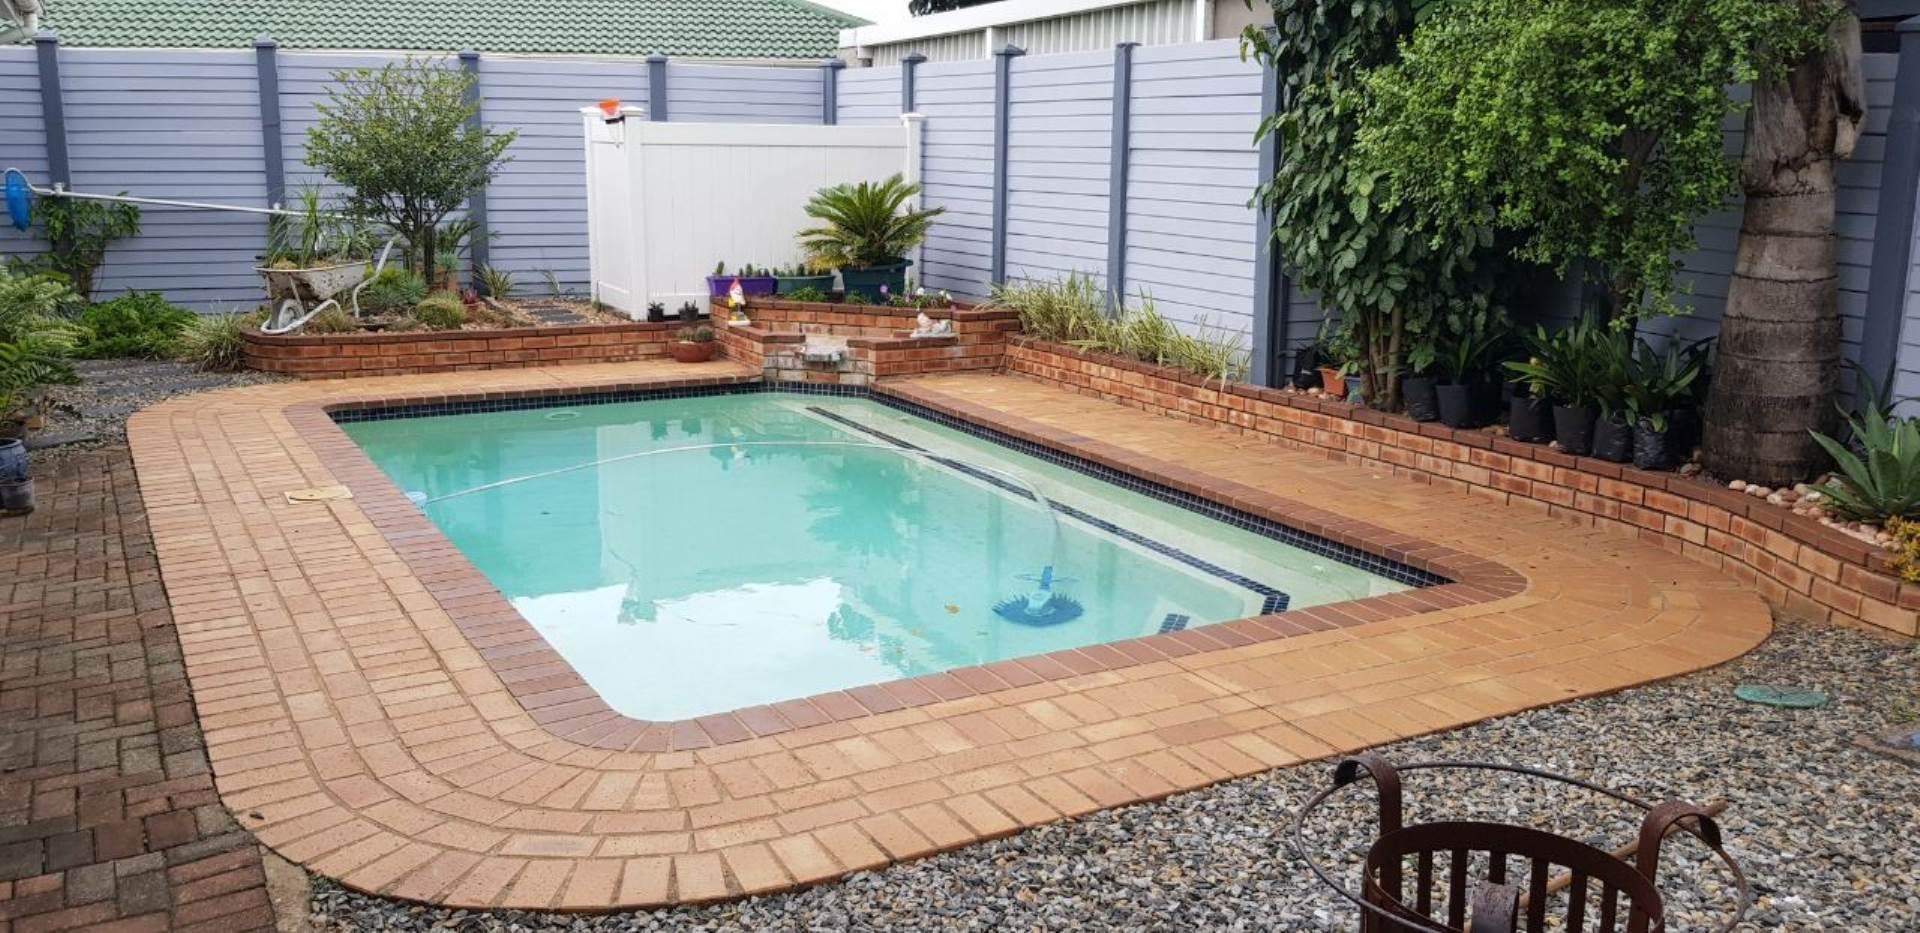 5 BedroomHouse For Sale In Birdswood